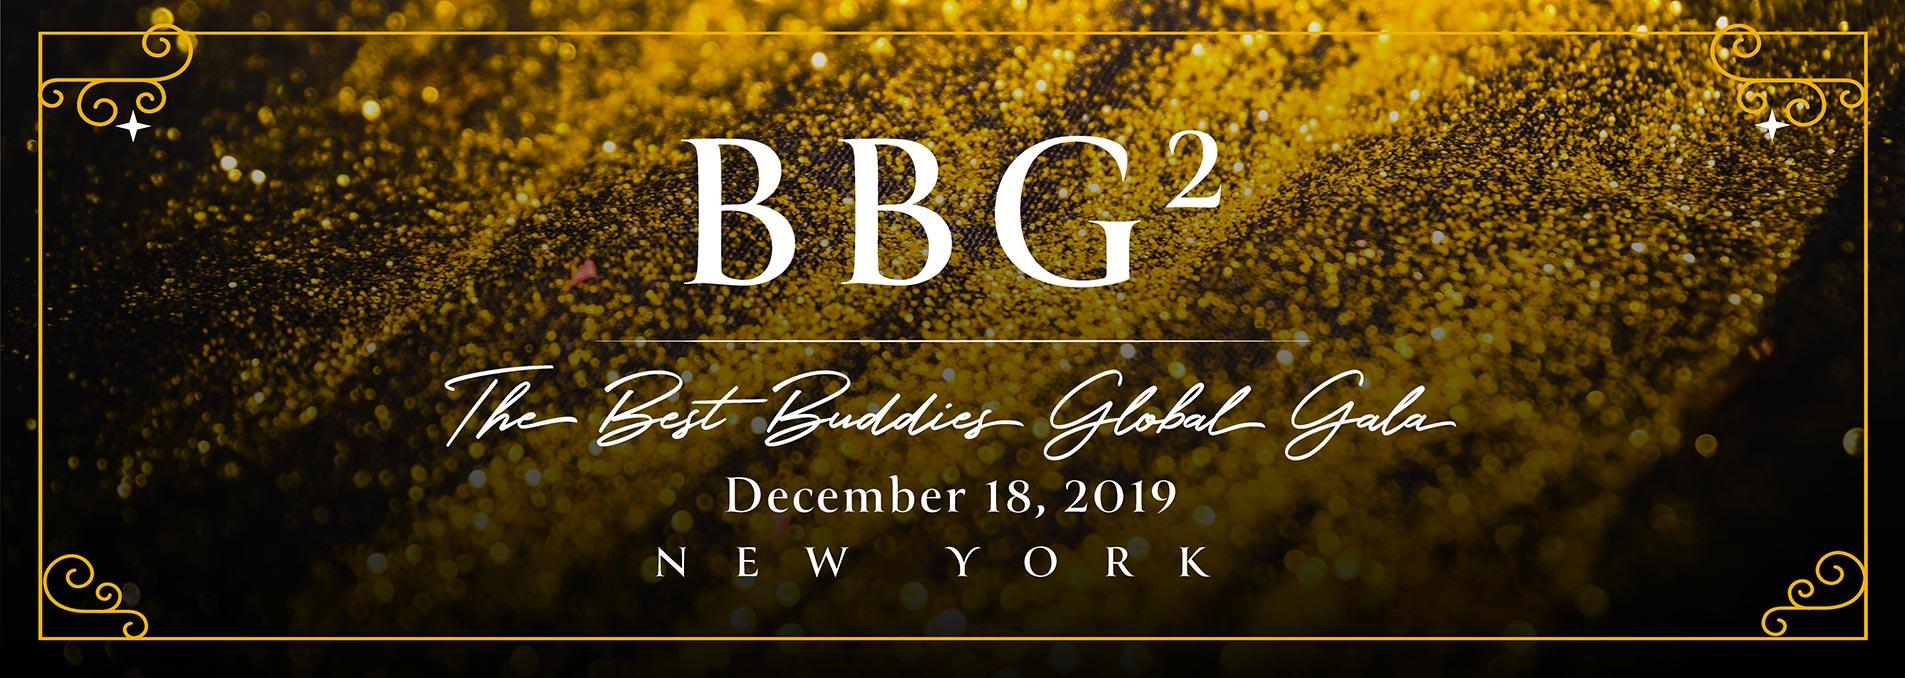 Best Buddies Global Gala - New York Banner